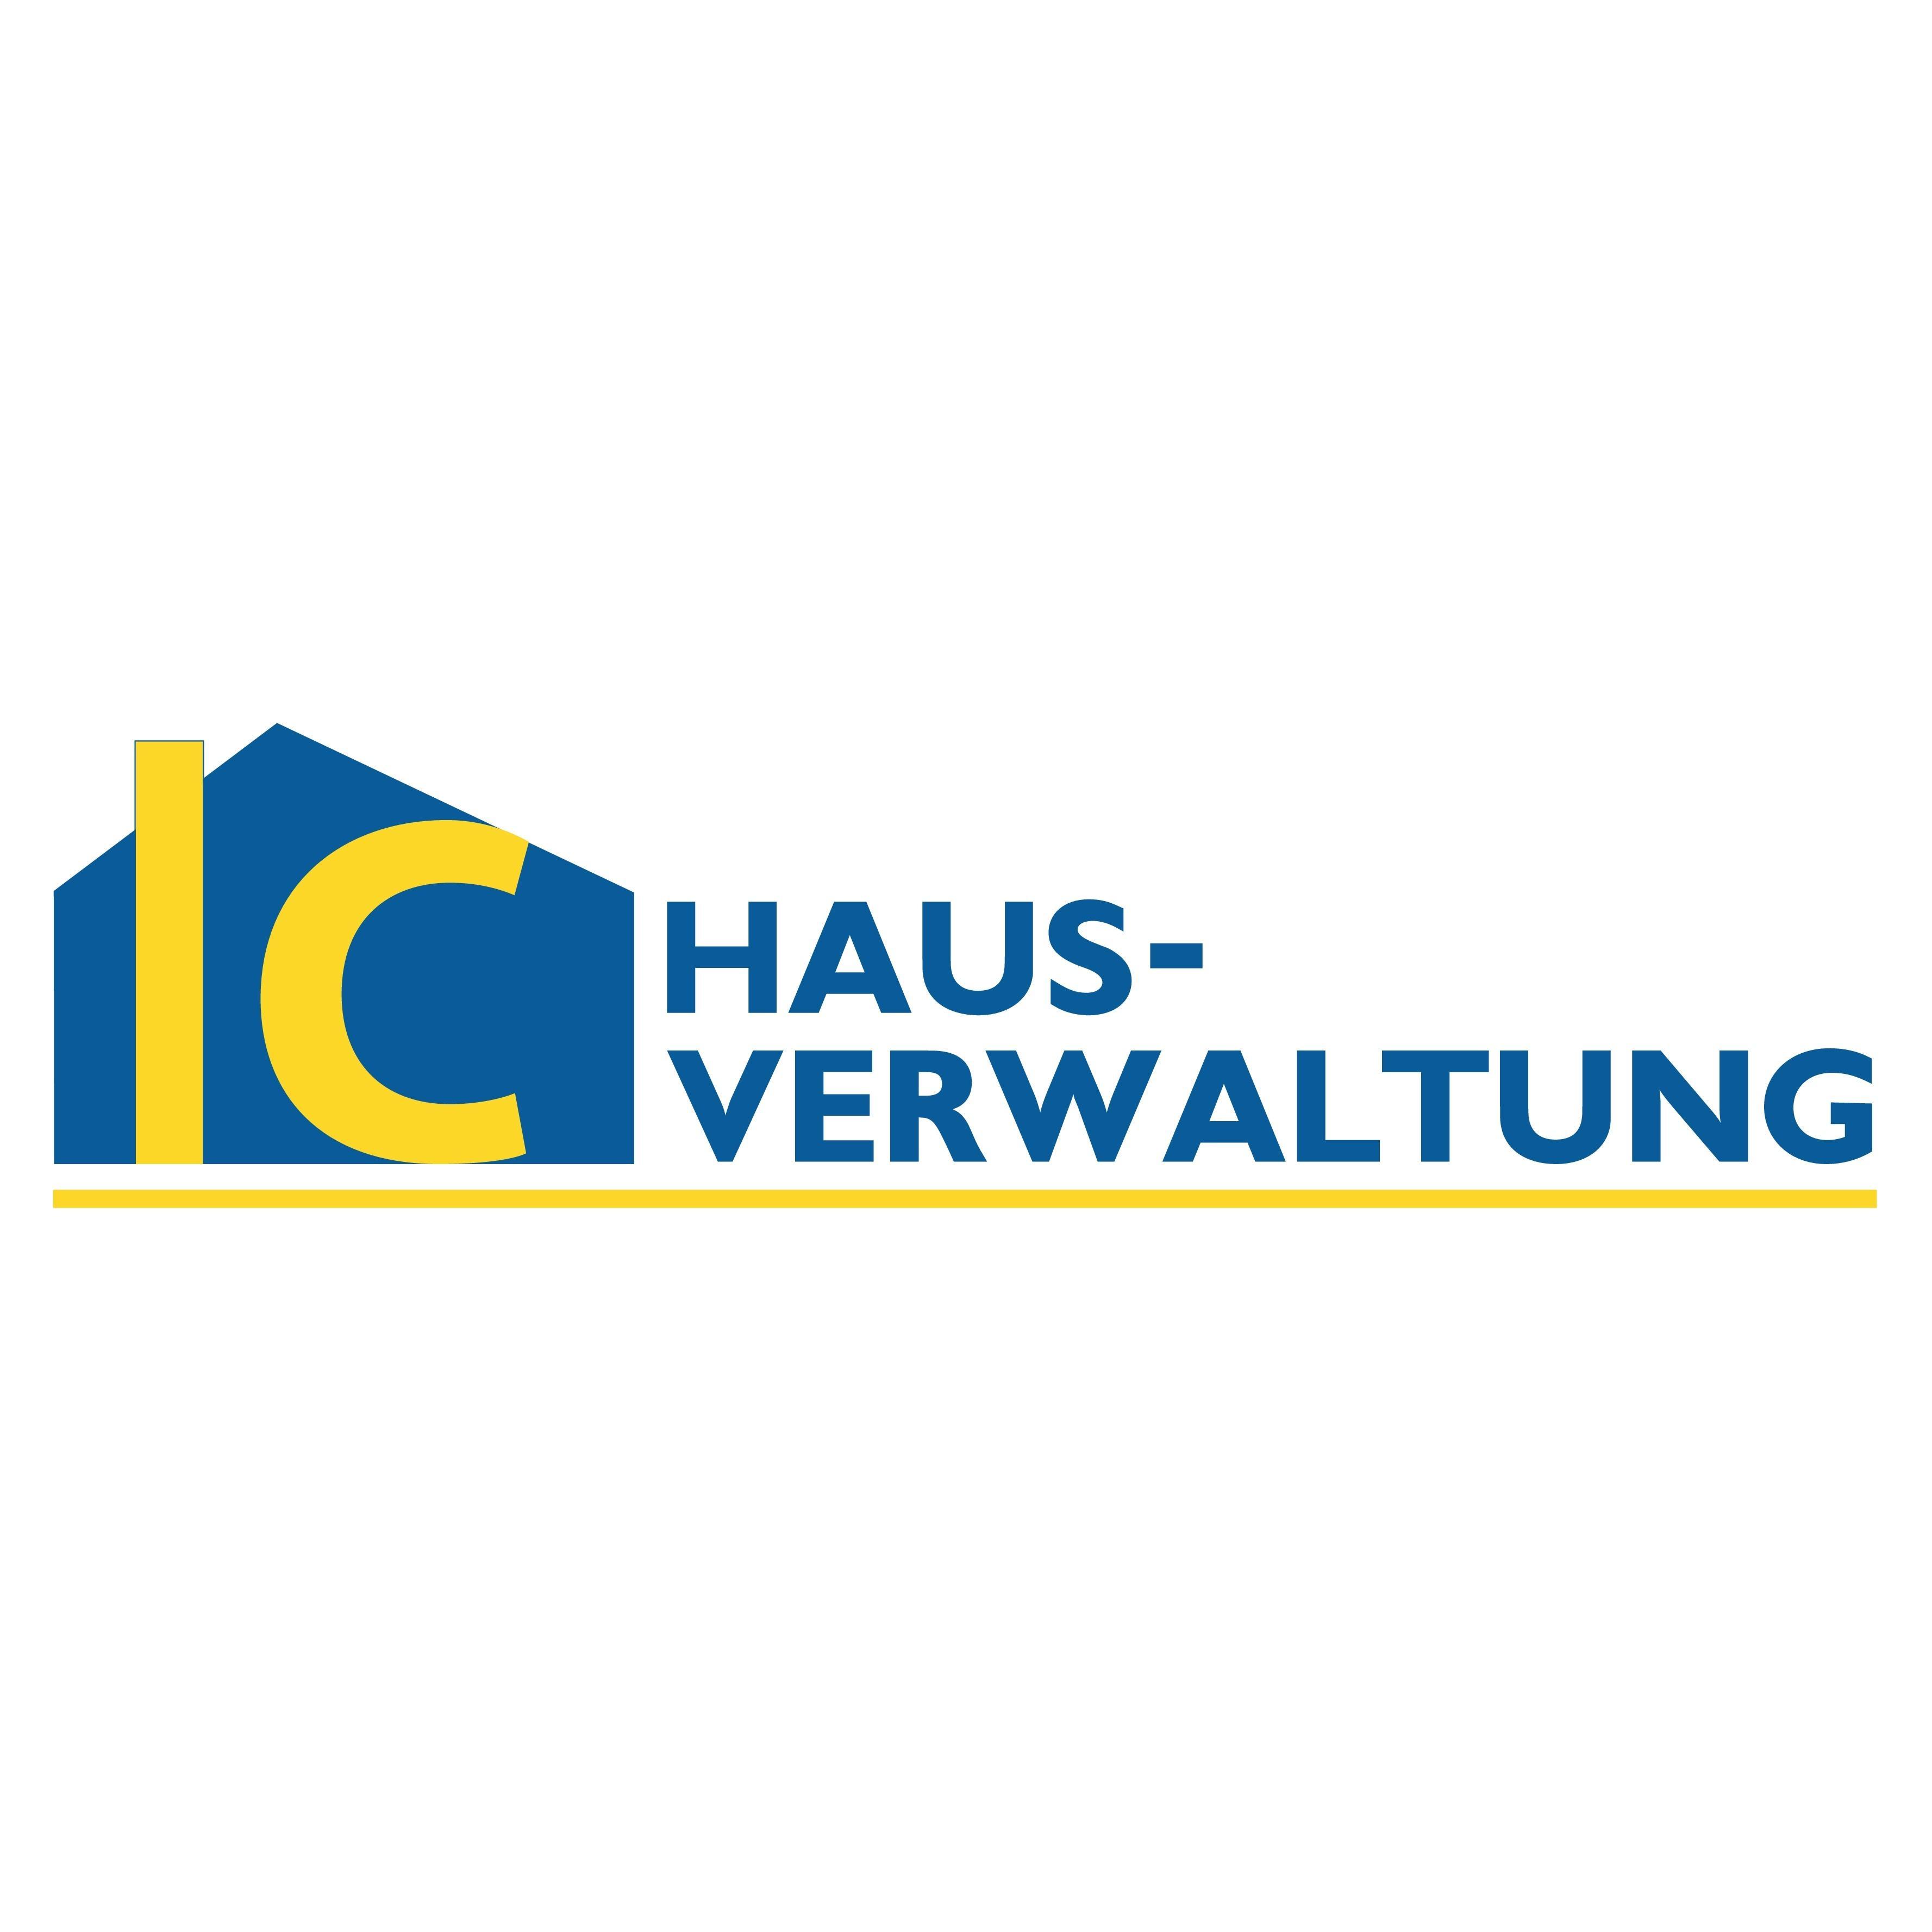 IC Hausverwaltung GmbH in 1070 Wien - Logo